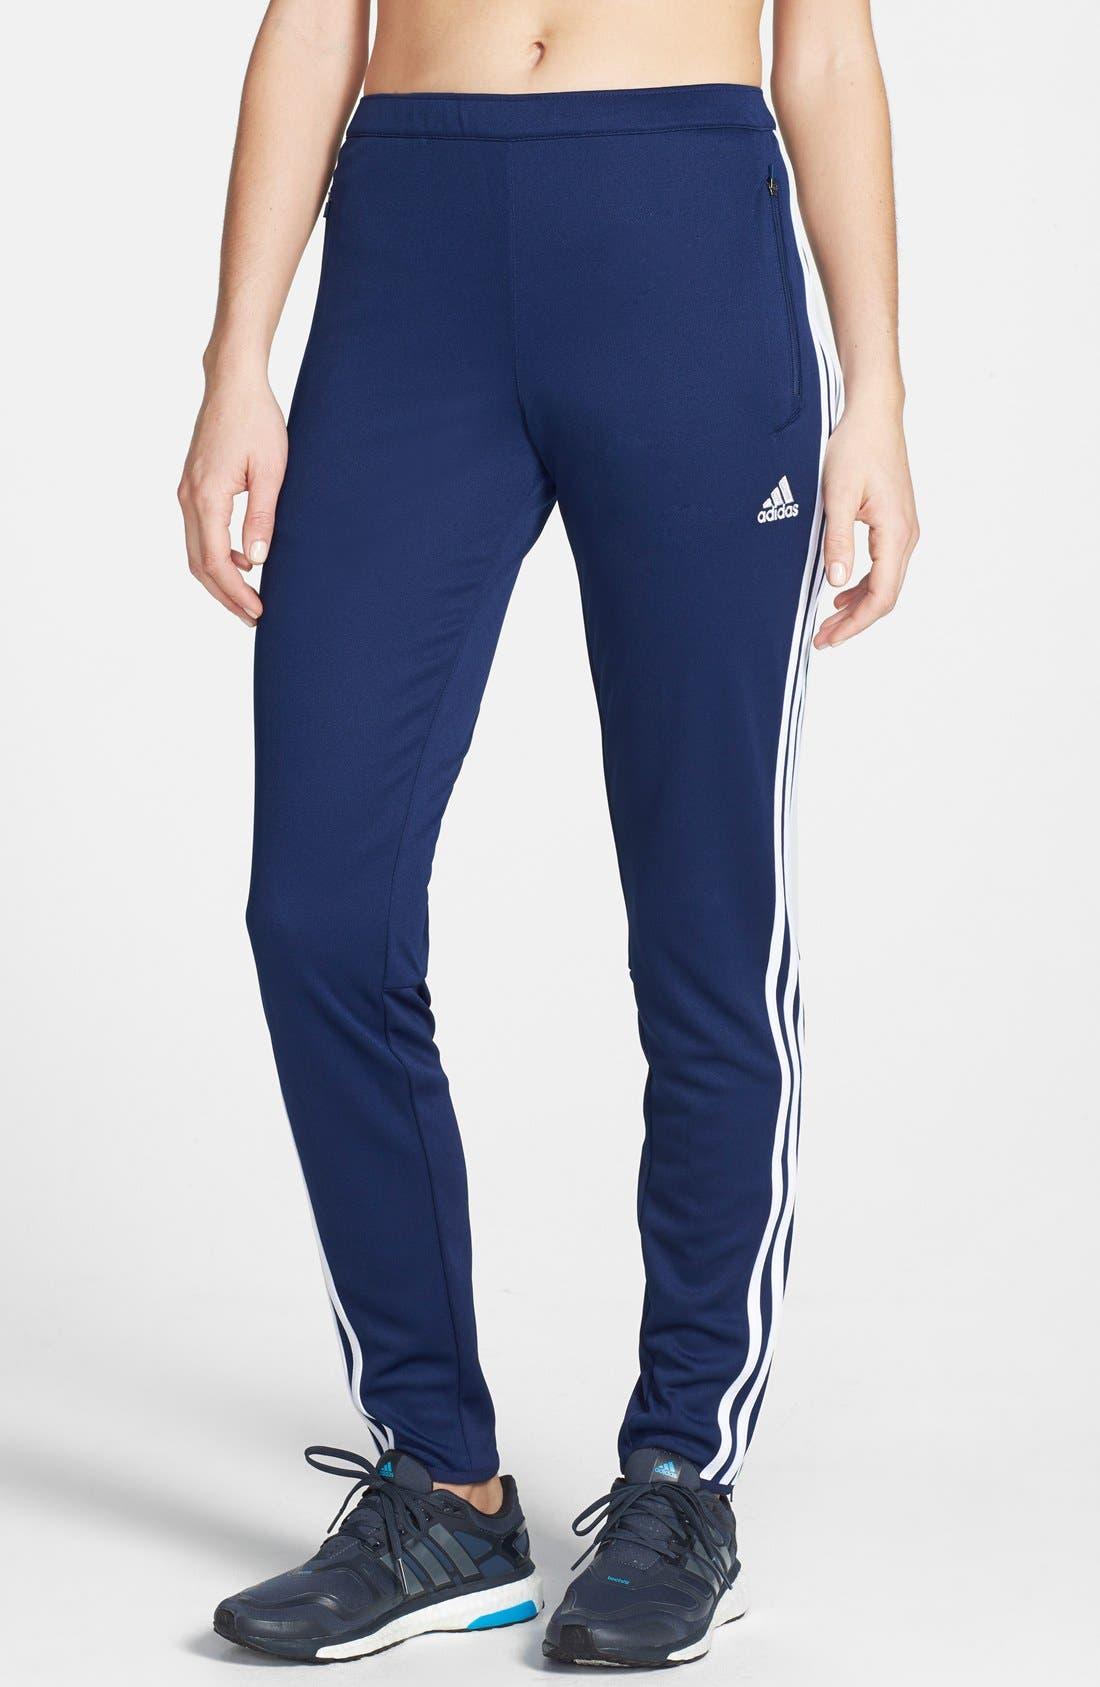 Alternate Image 1 Selected - adidas 'Tiro 13' Training Pants